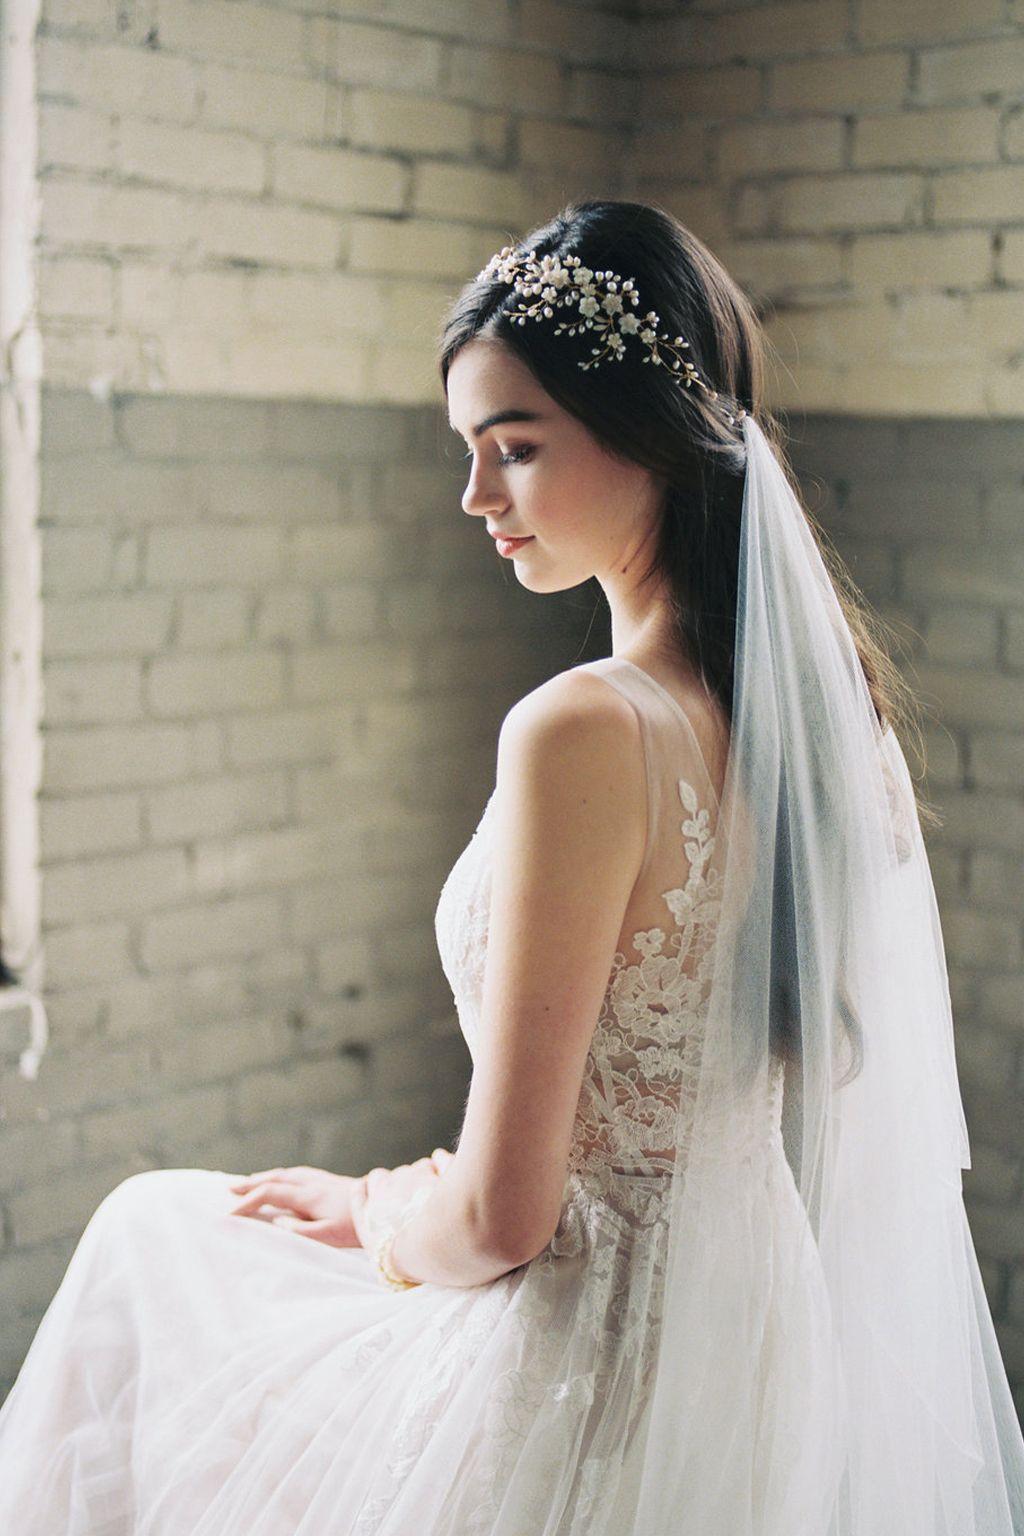 Wedding Headpiece With Hair Down Wedding Headpiece And Veil Romantic Bridal Hair Bohem Wedding Dress With Veil Floral Headpiece Wedding Bridal Headpieces